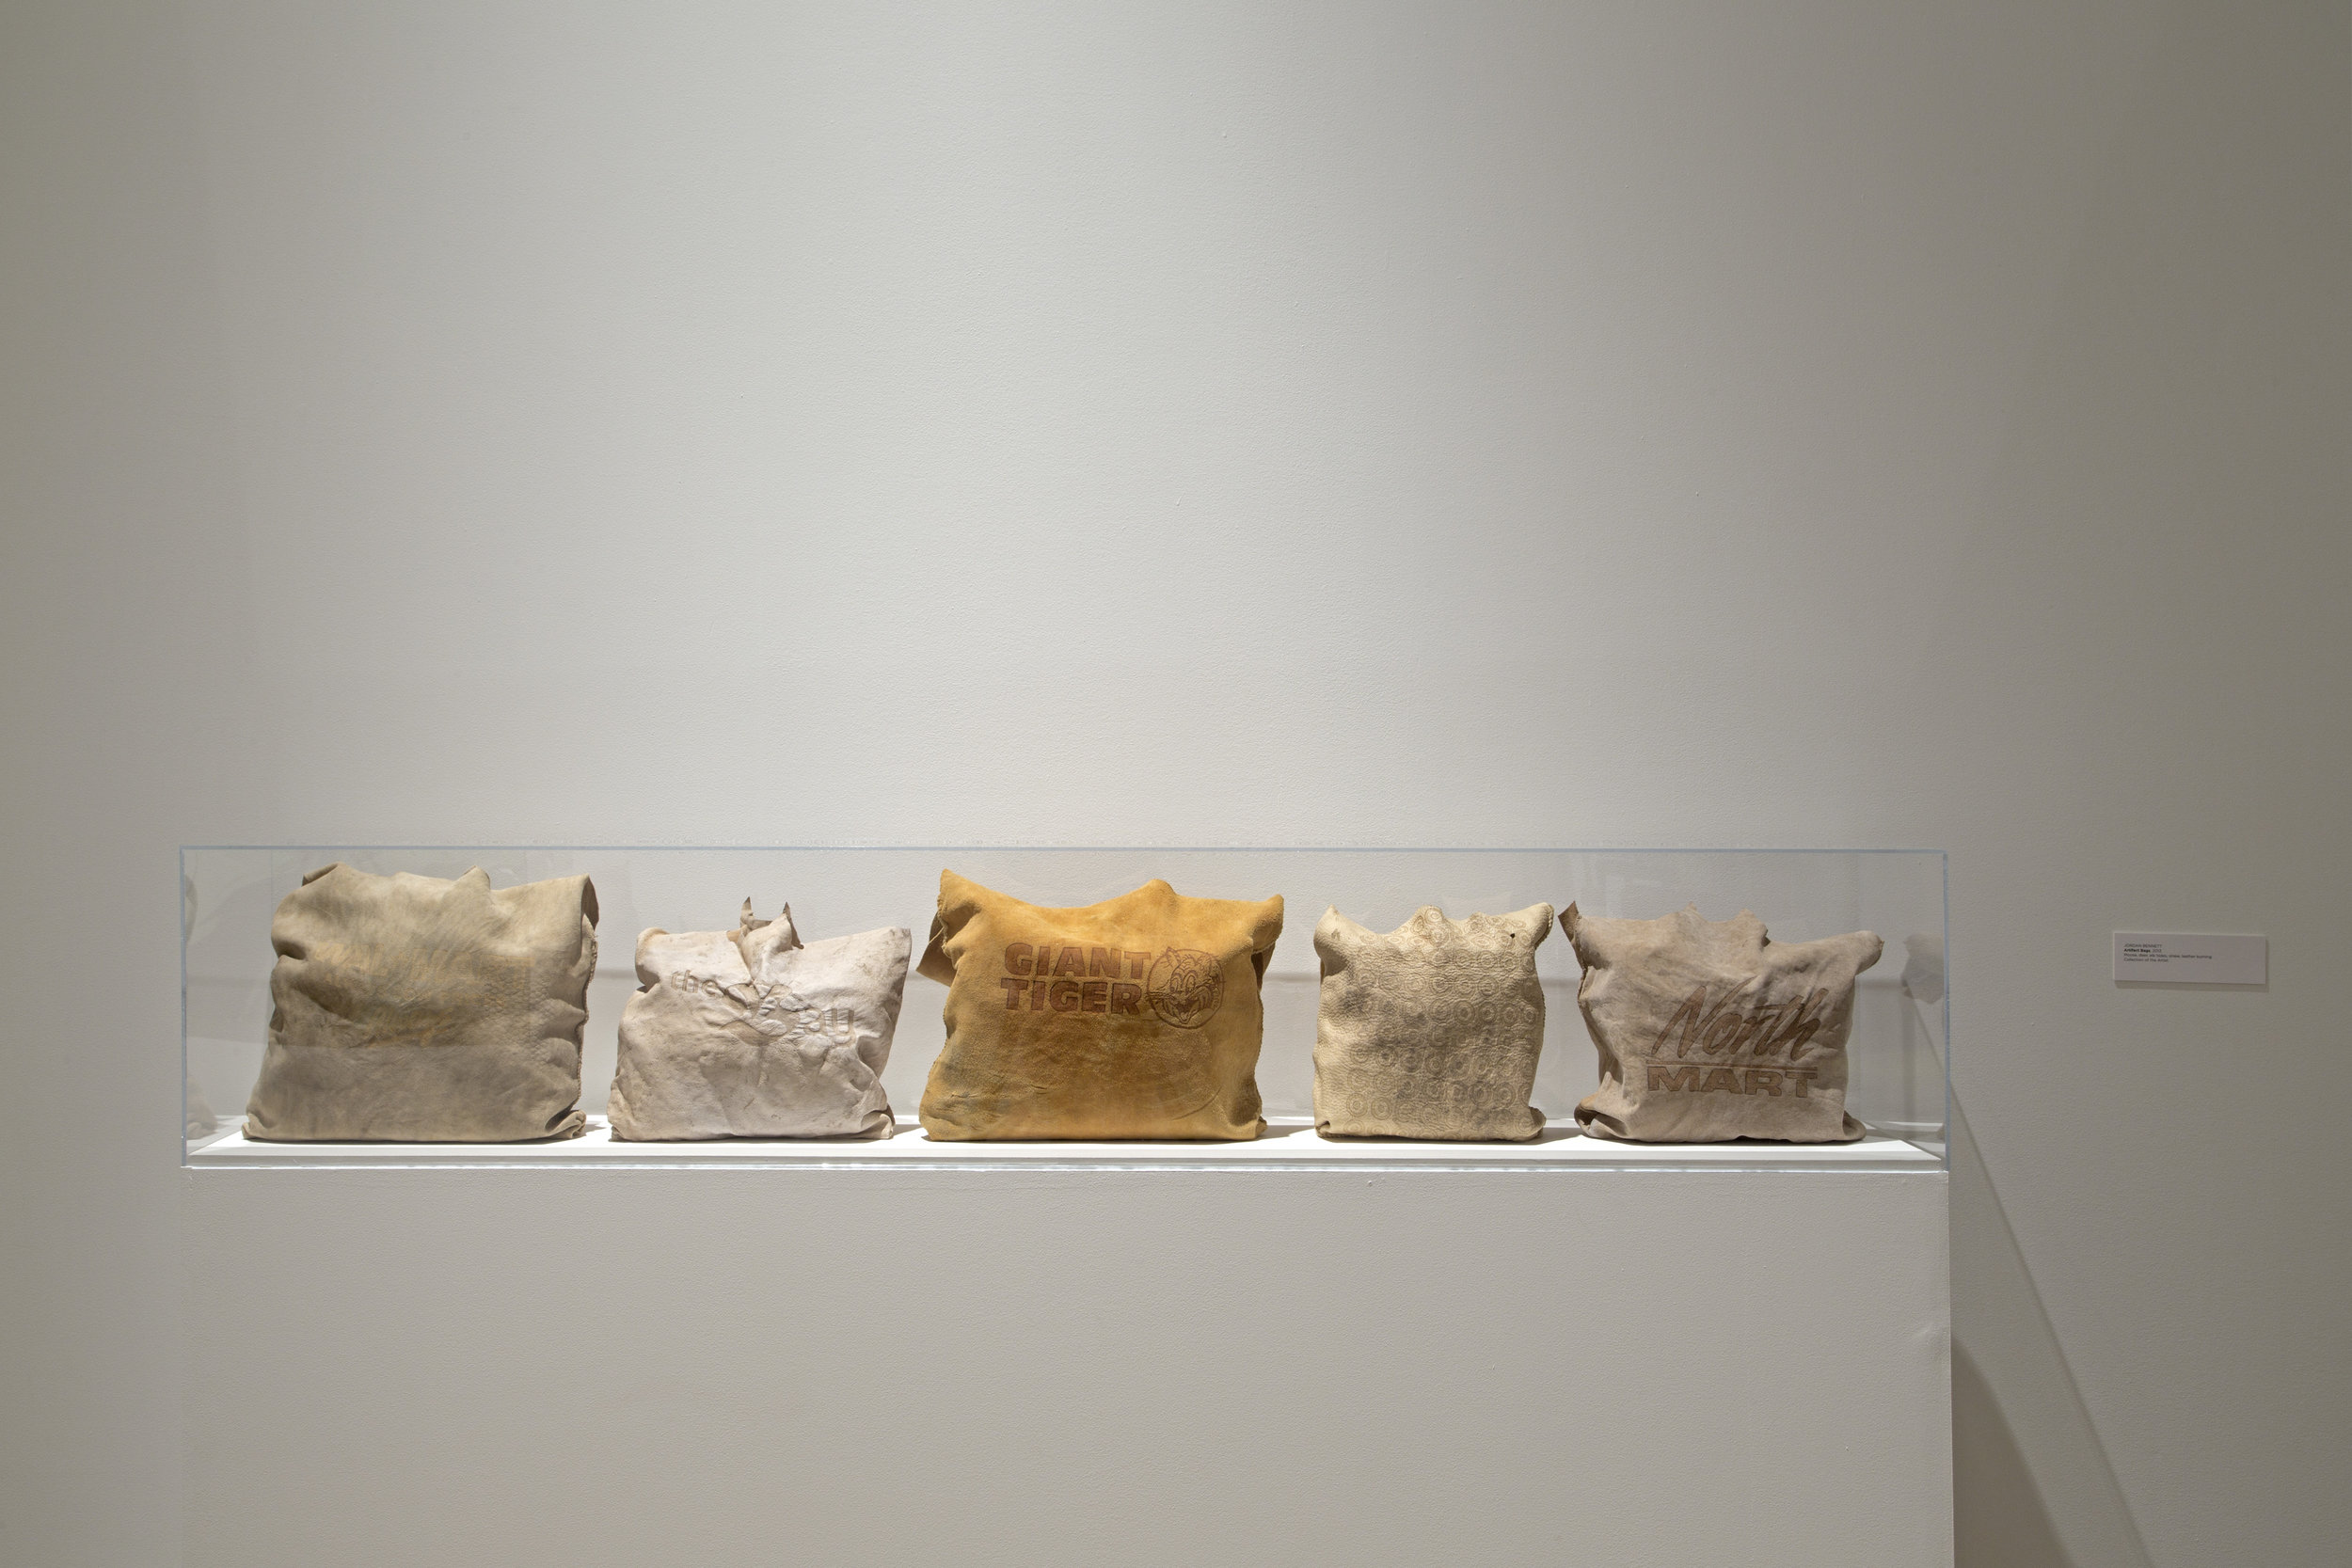 Artifact Bag: Giant Tiger, Wal-Mart, Target, North Mart, The Bay,2013-2014